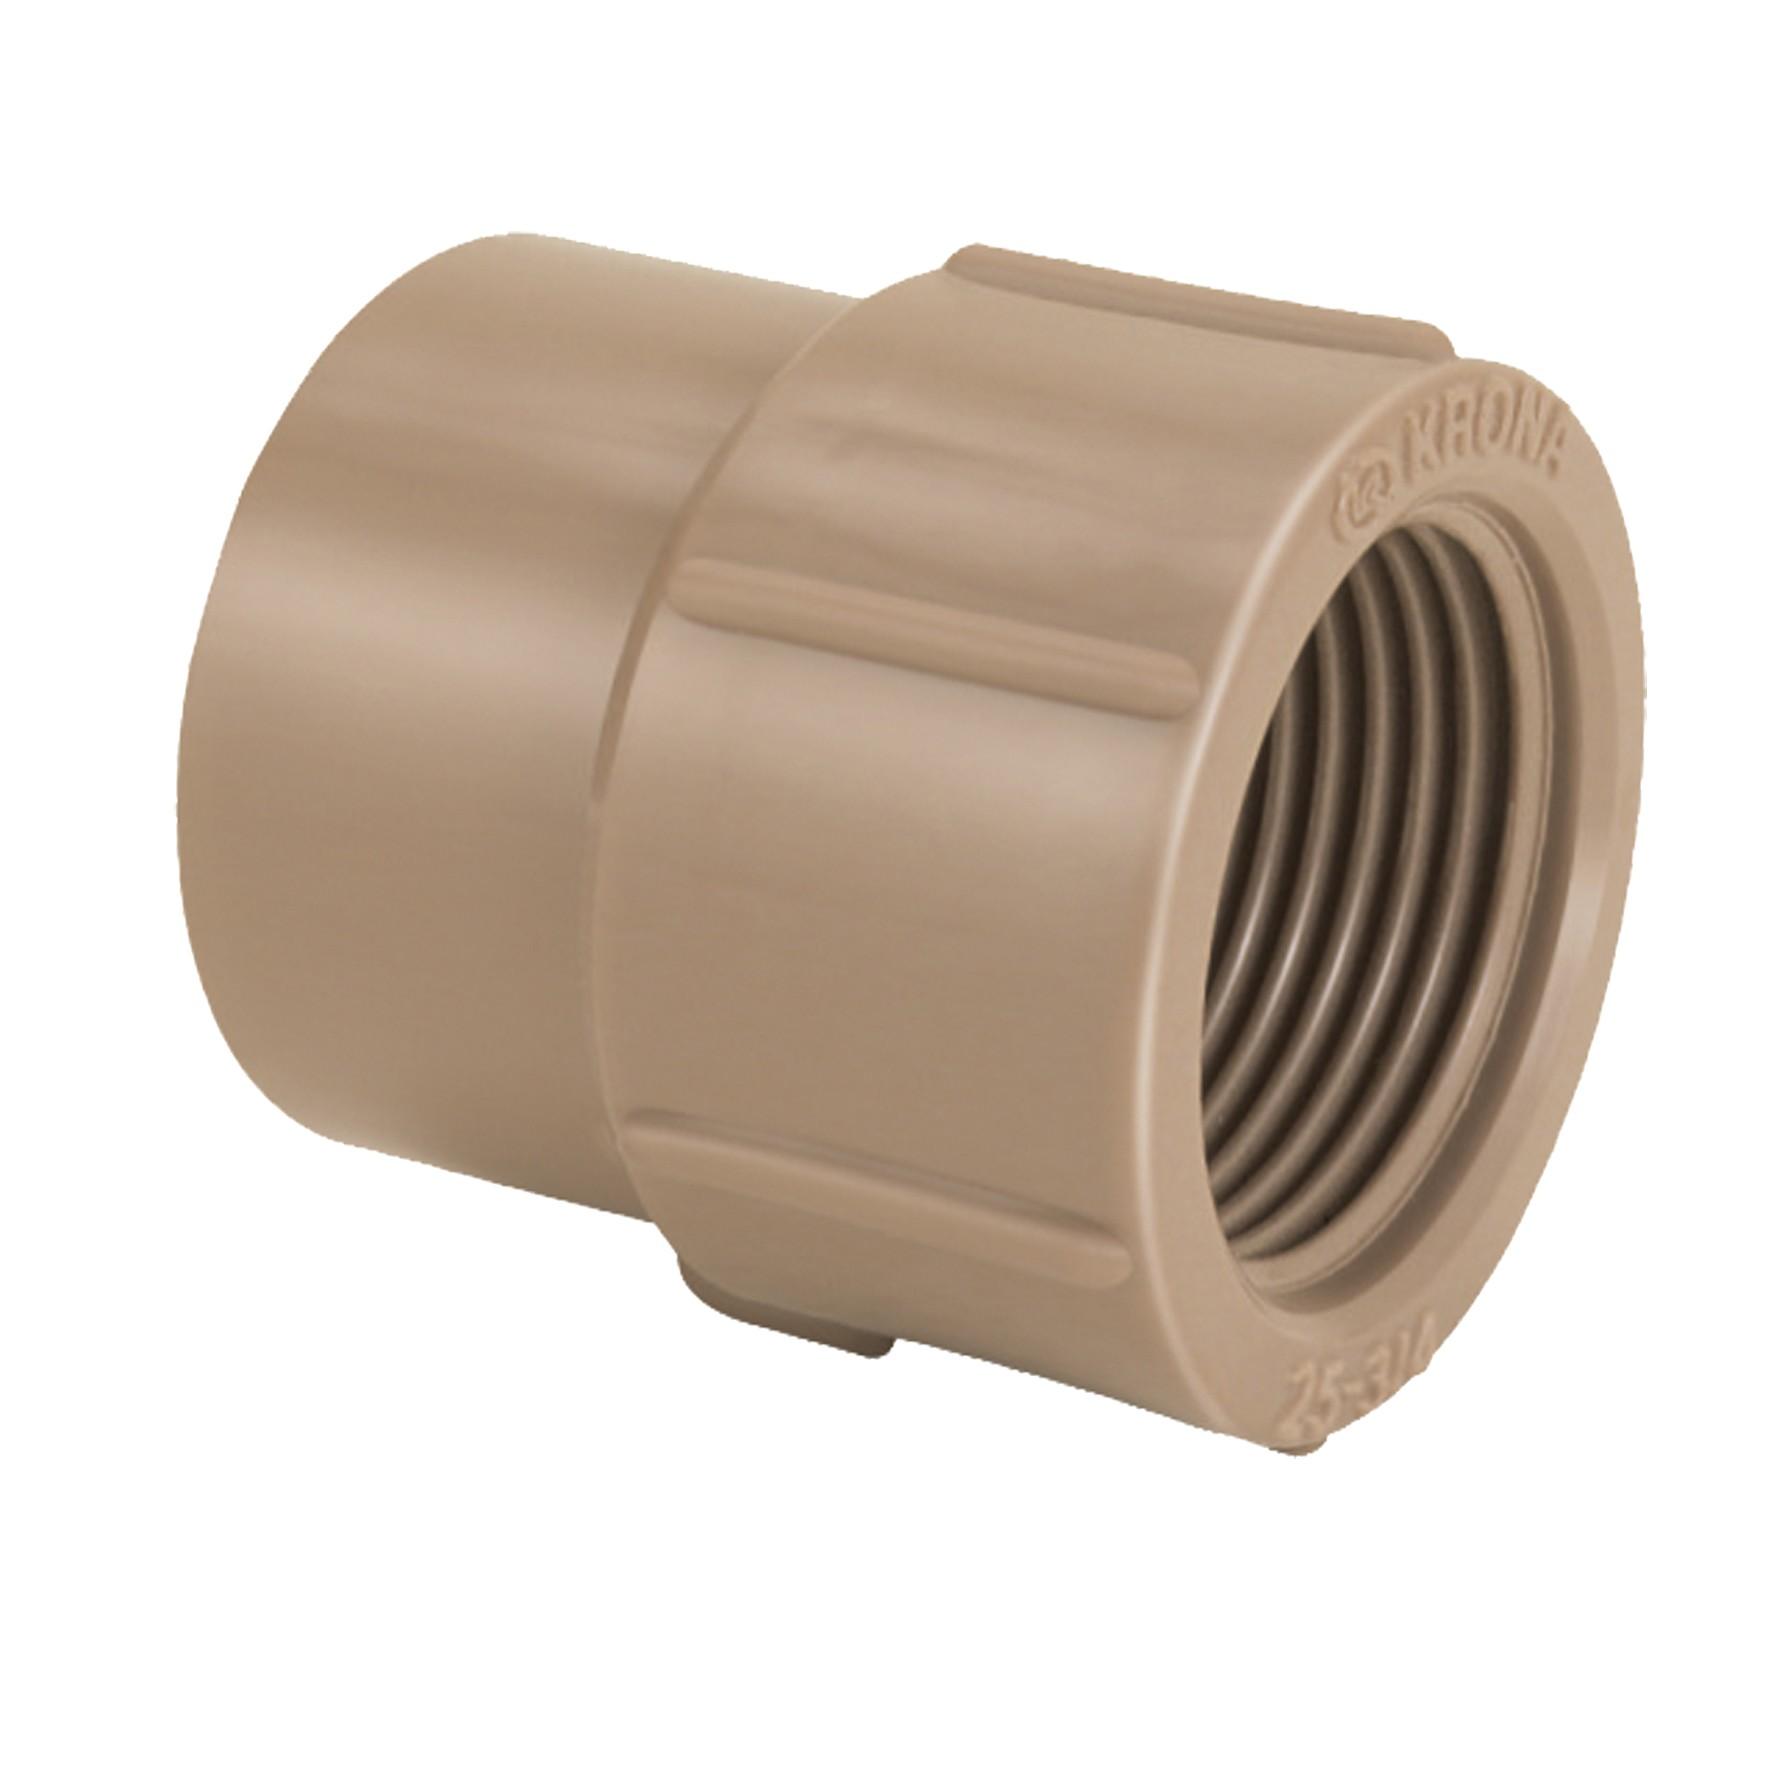 Luva PVC Marrom 25 mm x 34 - Krona